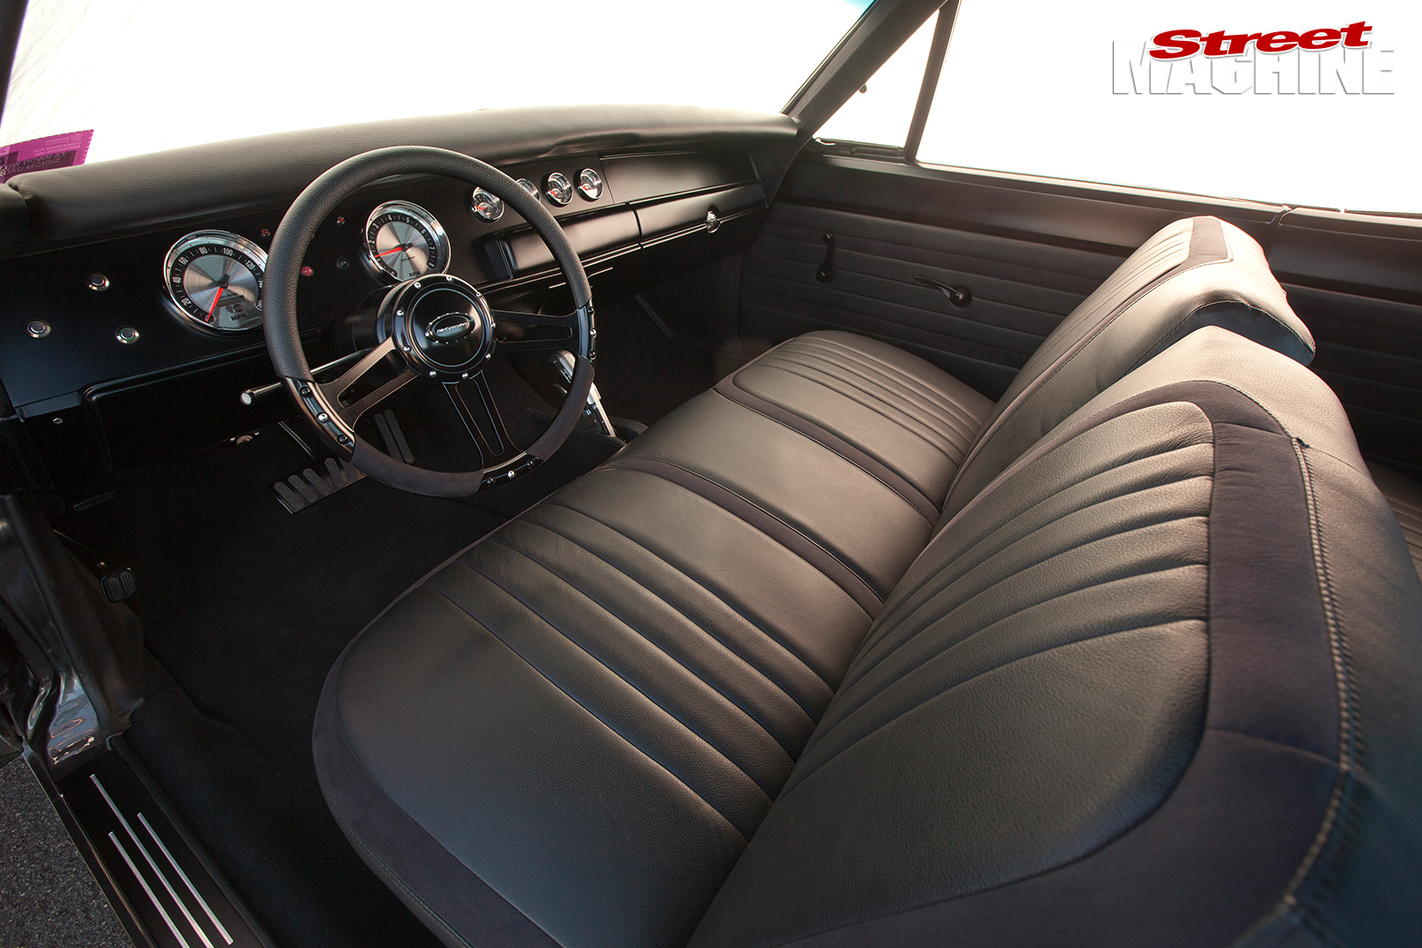 500-CUBE-1970-PLYMOUTH-SATELLITE-interior